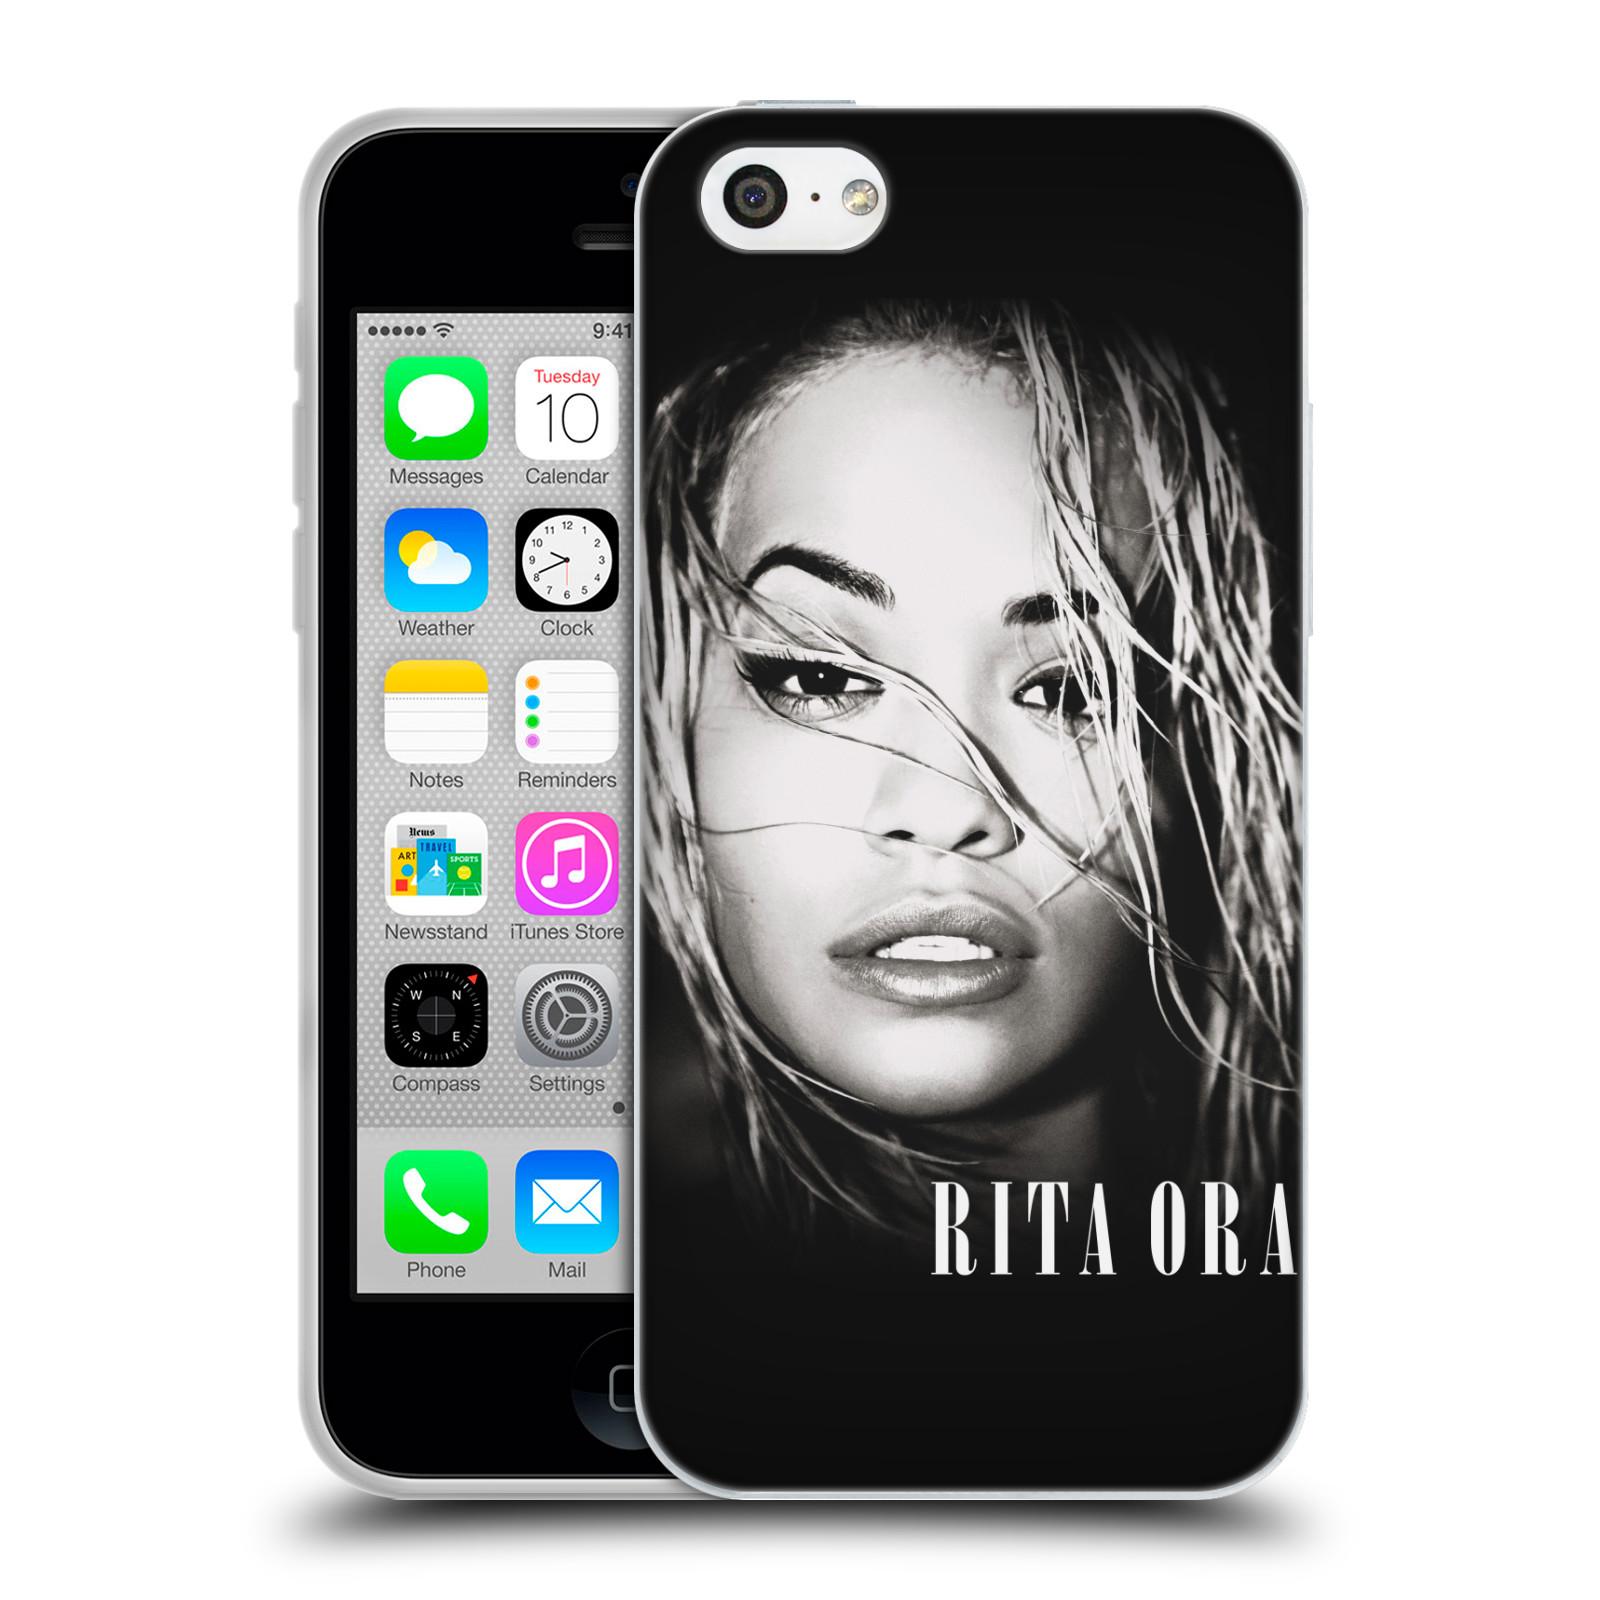 HEAD CASE silikonový obal na mobil Apple Iphone 5C zpěvačka Rita Ora foto tvář